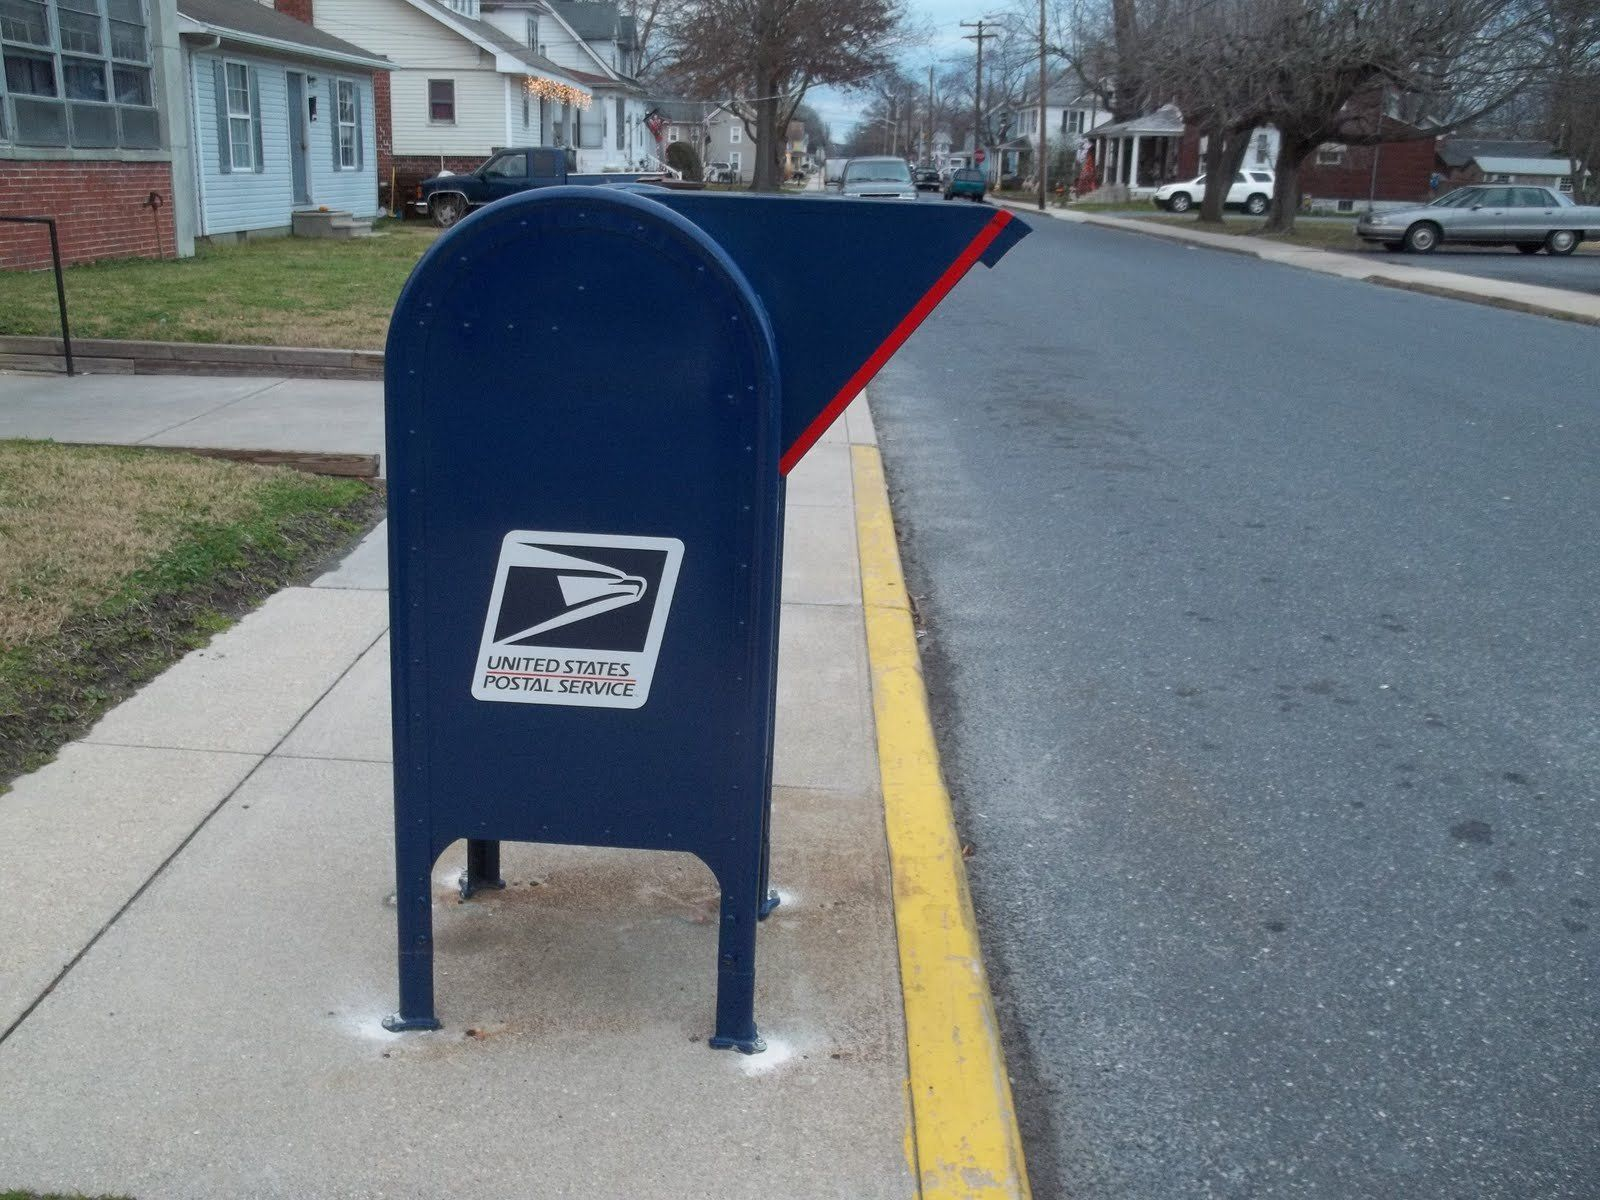 Post Office Near Me